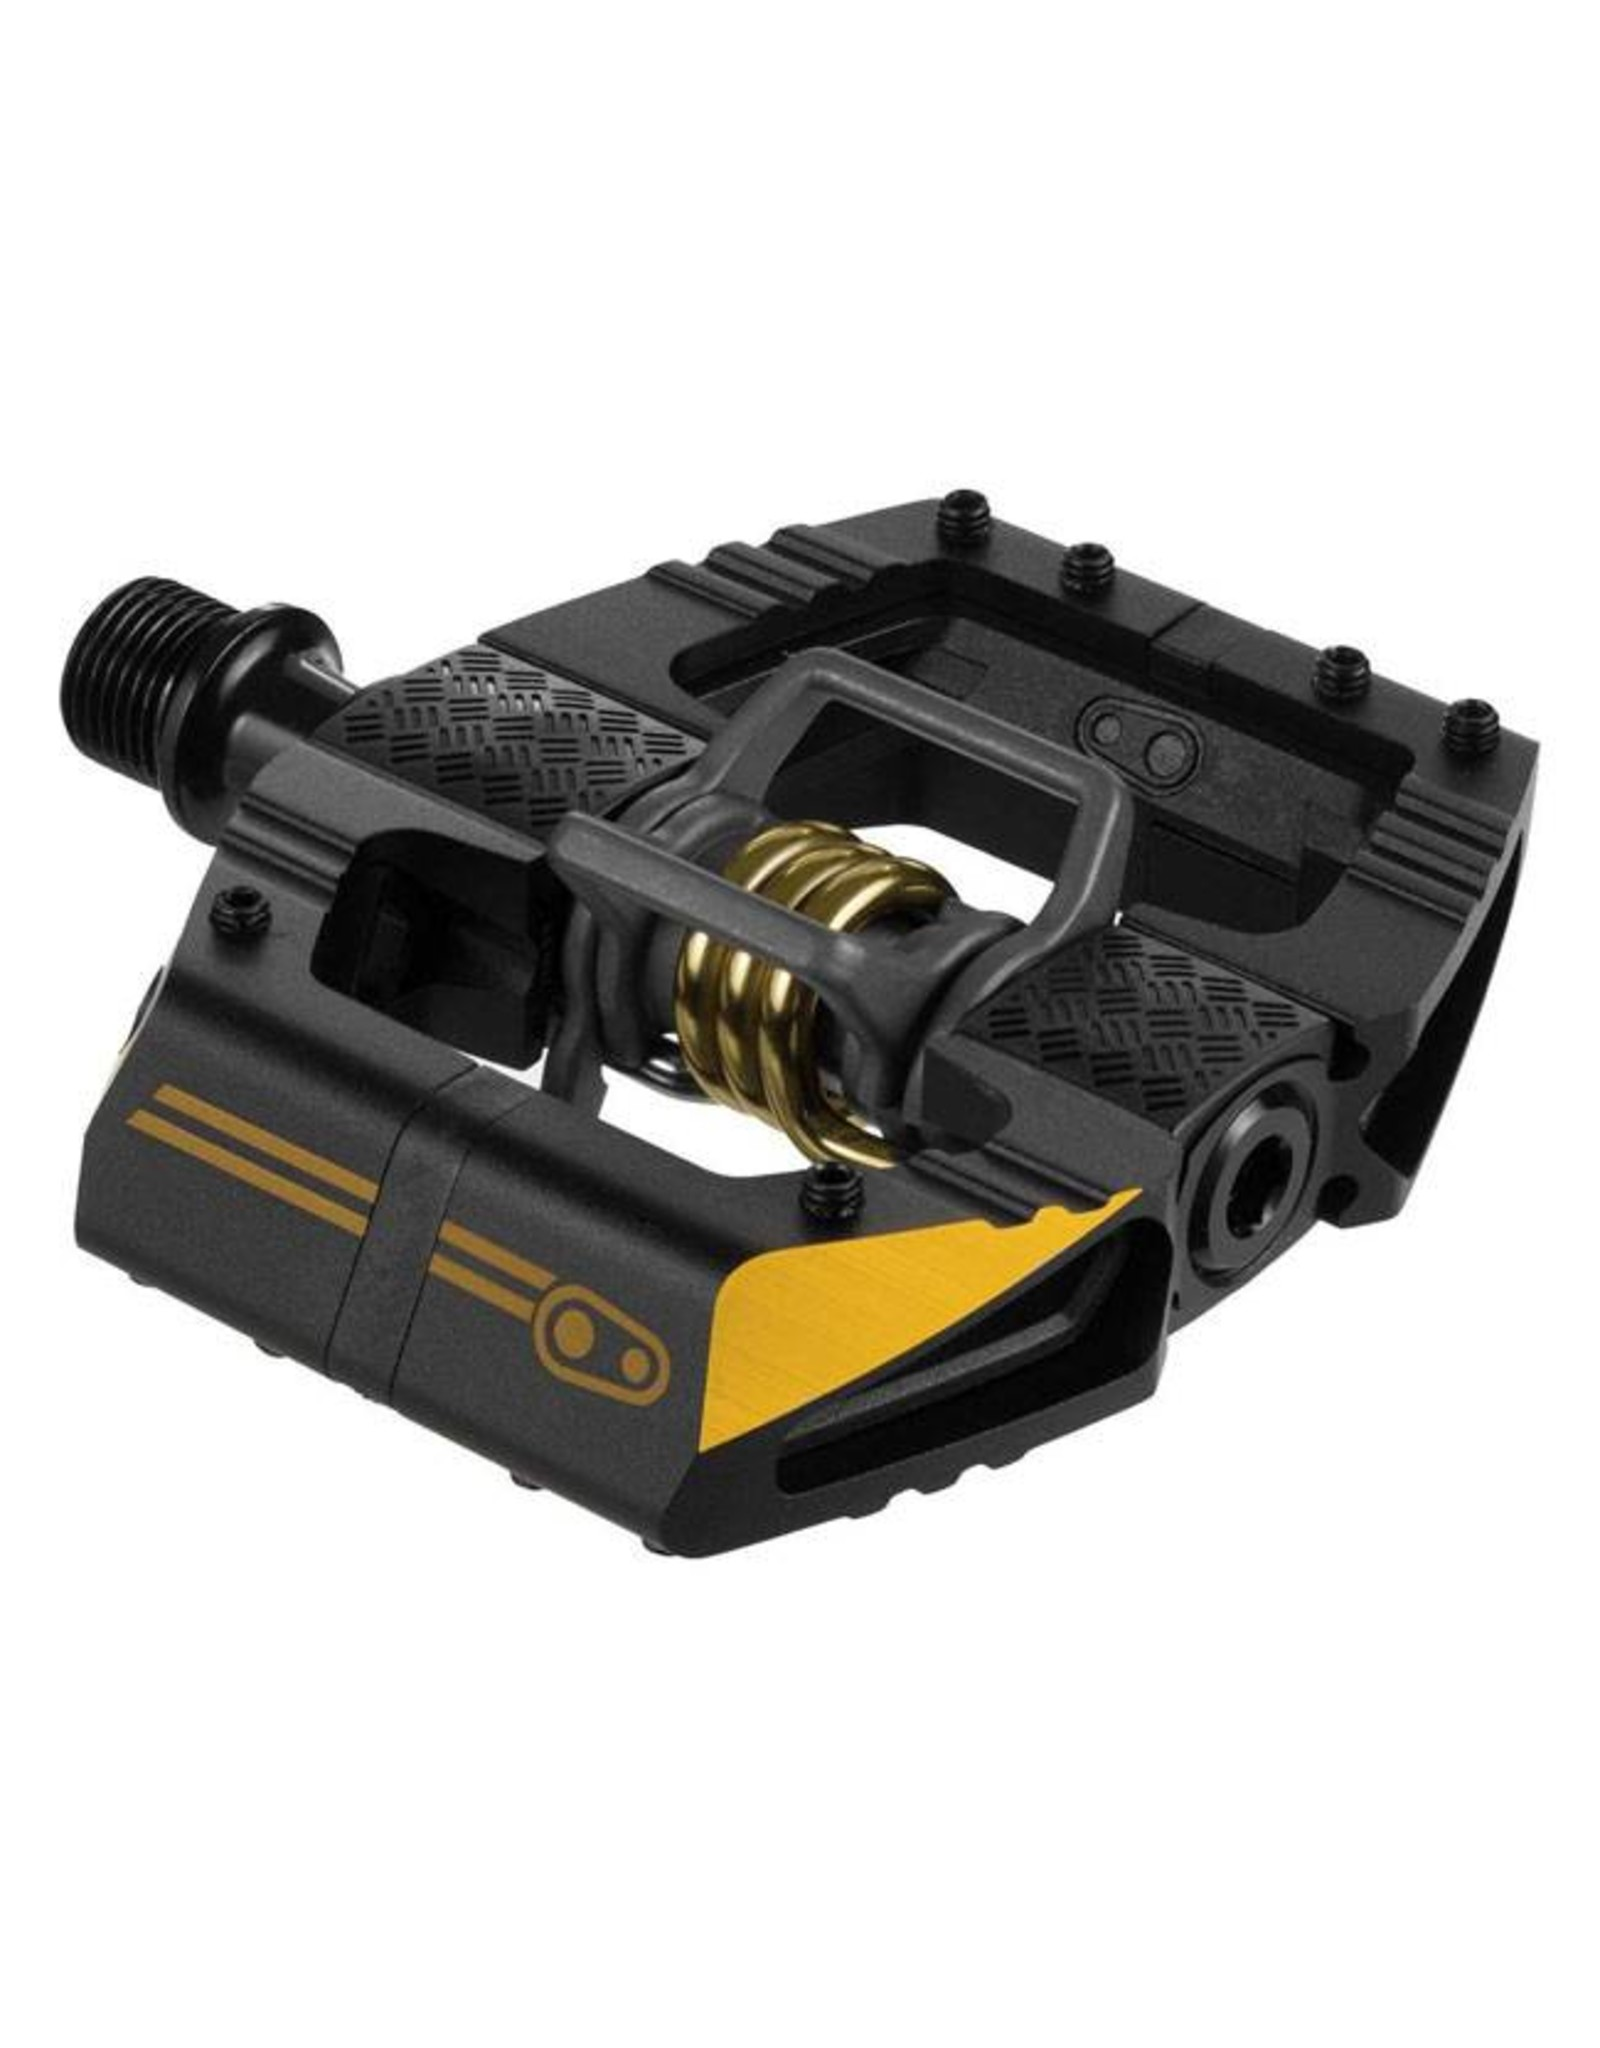 Crank Brothers Crank Brothers Mallet Enduro 11 Pedals: Black/Gold